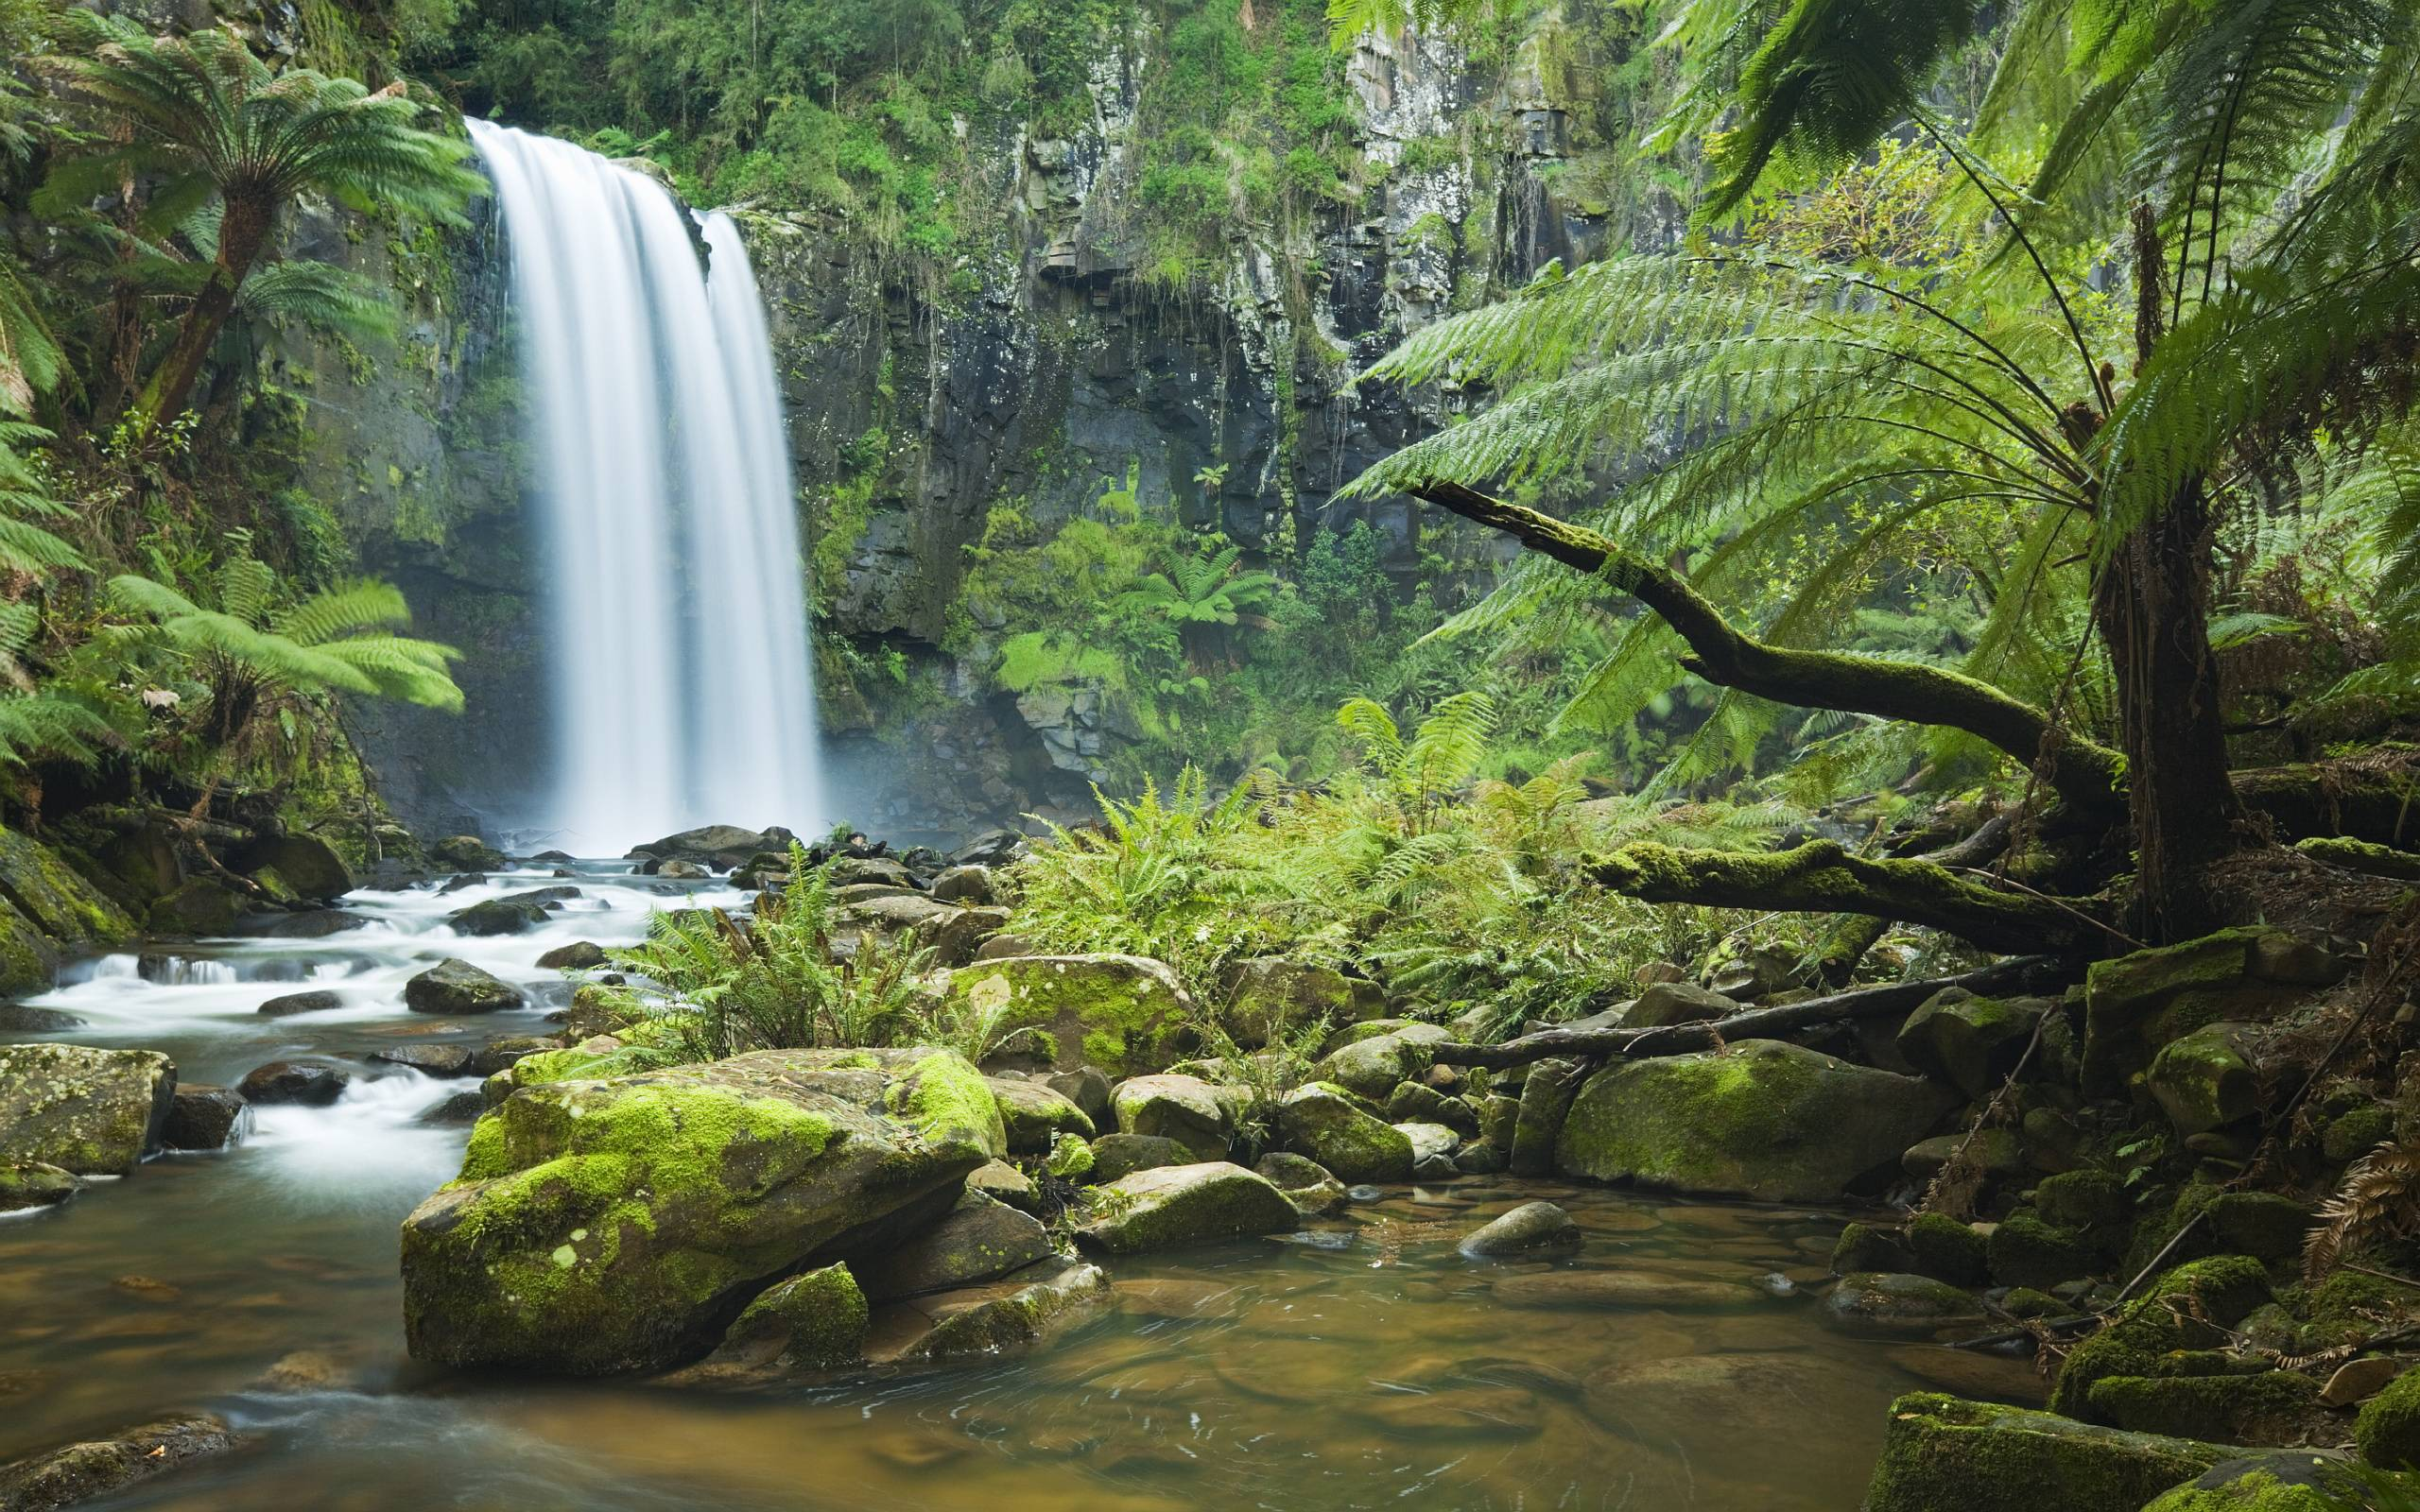 Rain Forest Backgrounds - Wallpaper Cave